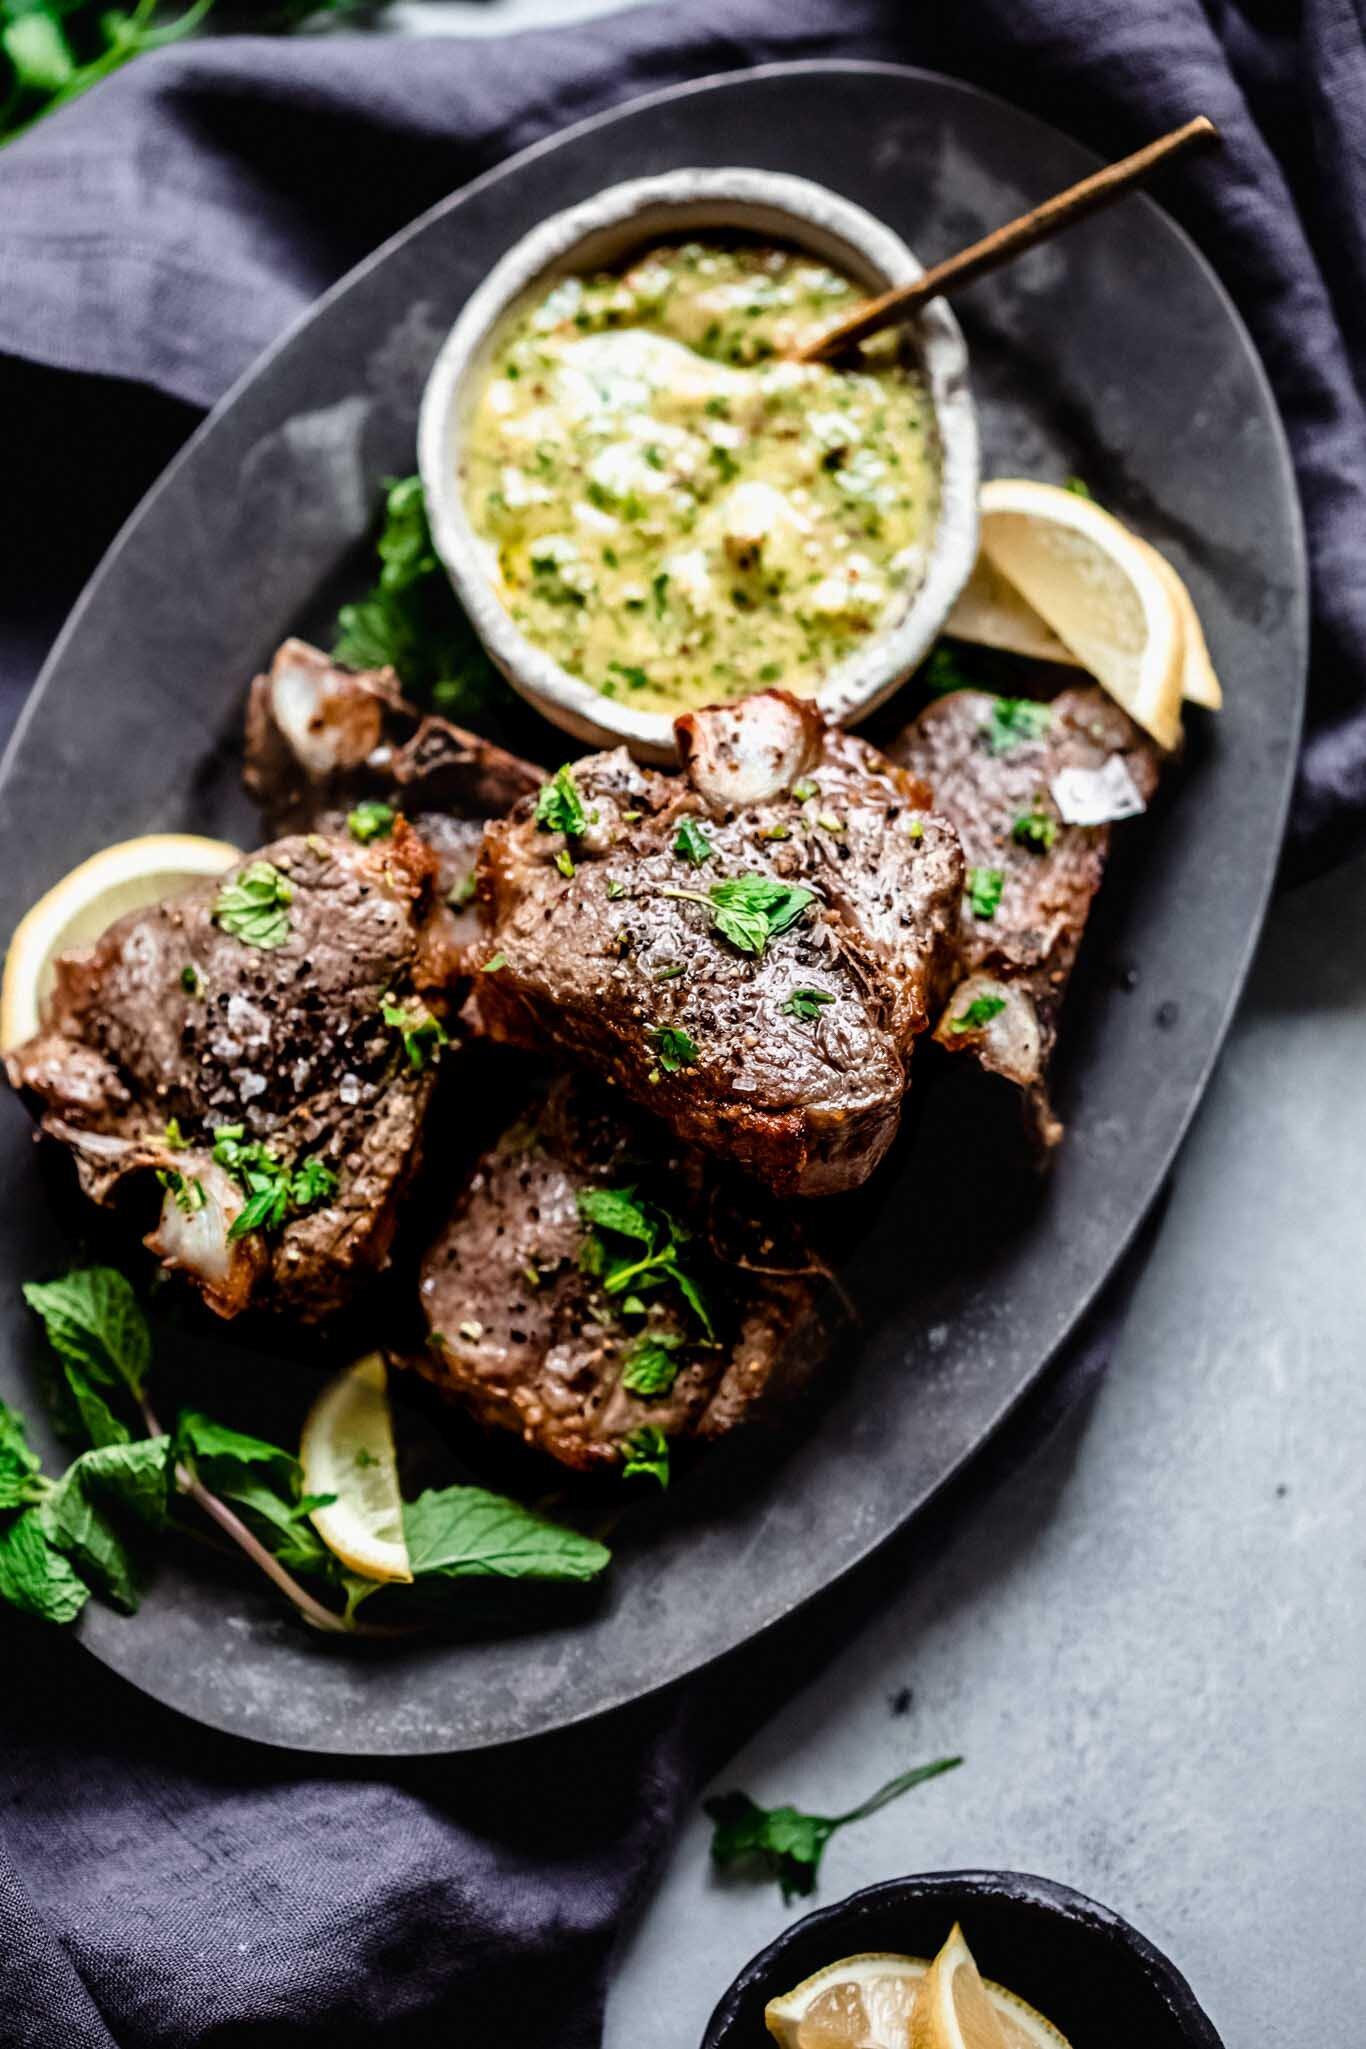 lamb chops with wholegrain mustard Broiled (or Grilled) American Lamb Chops with Mint Mustard Sauce